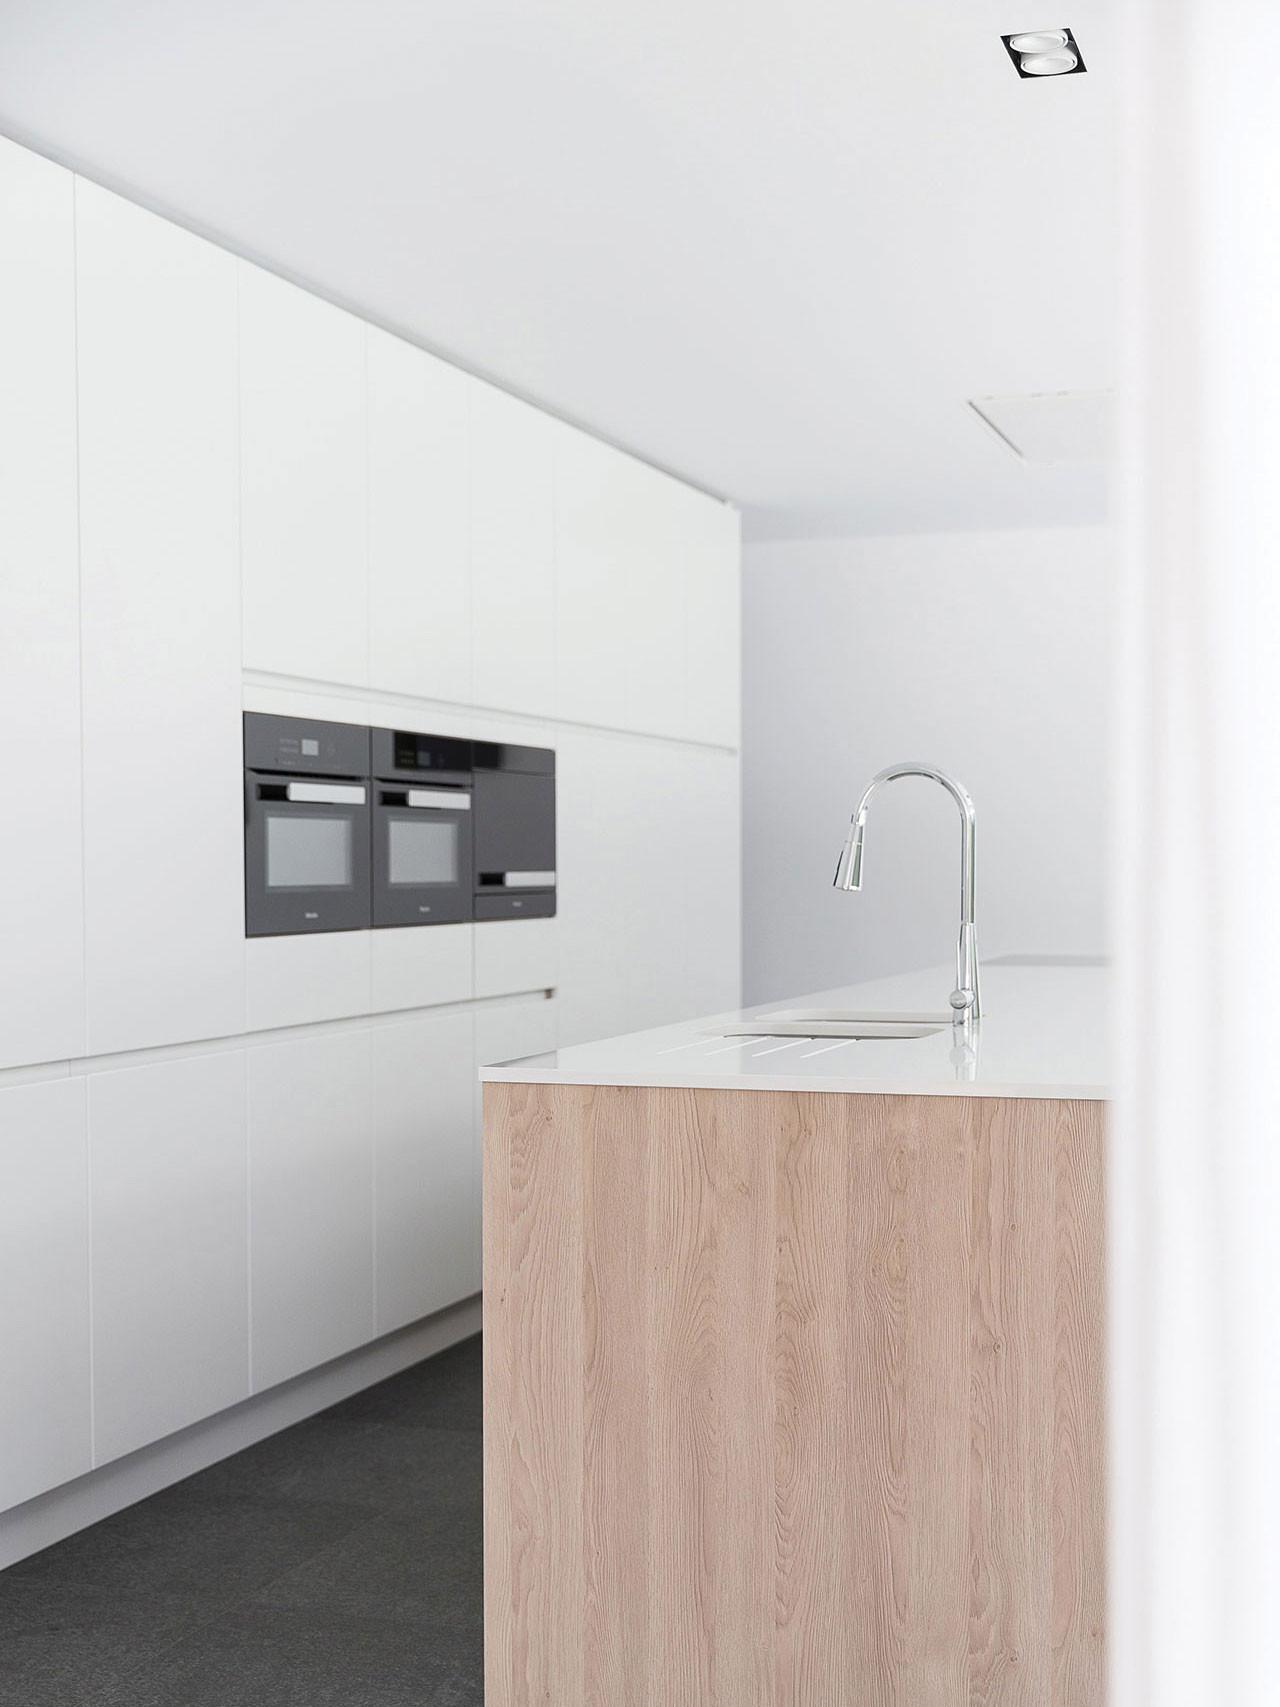 Dekeyzer-hedendaagse-keuken-greeploos-satijnlak-houtdecor-6.jpg